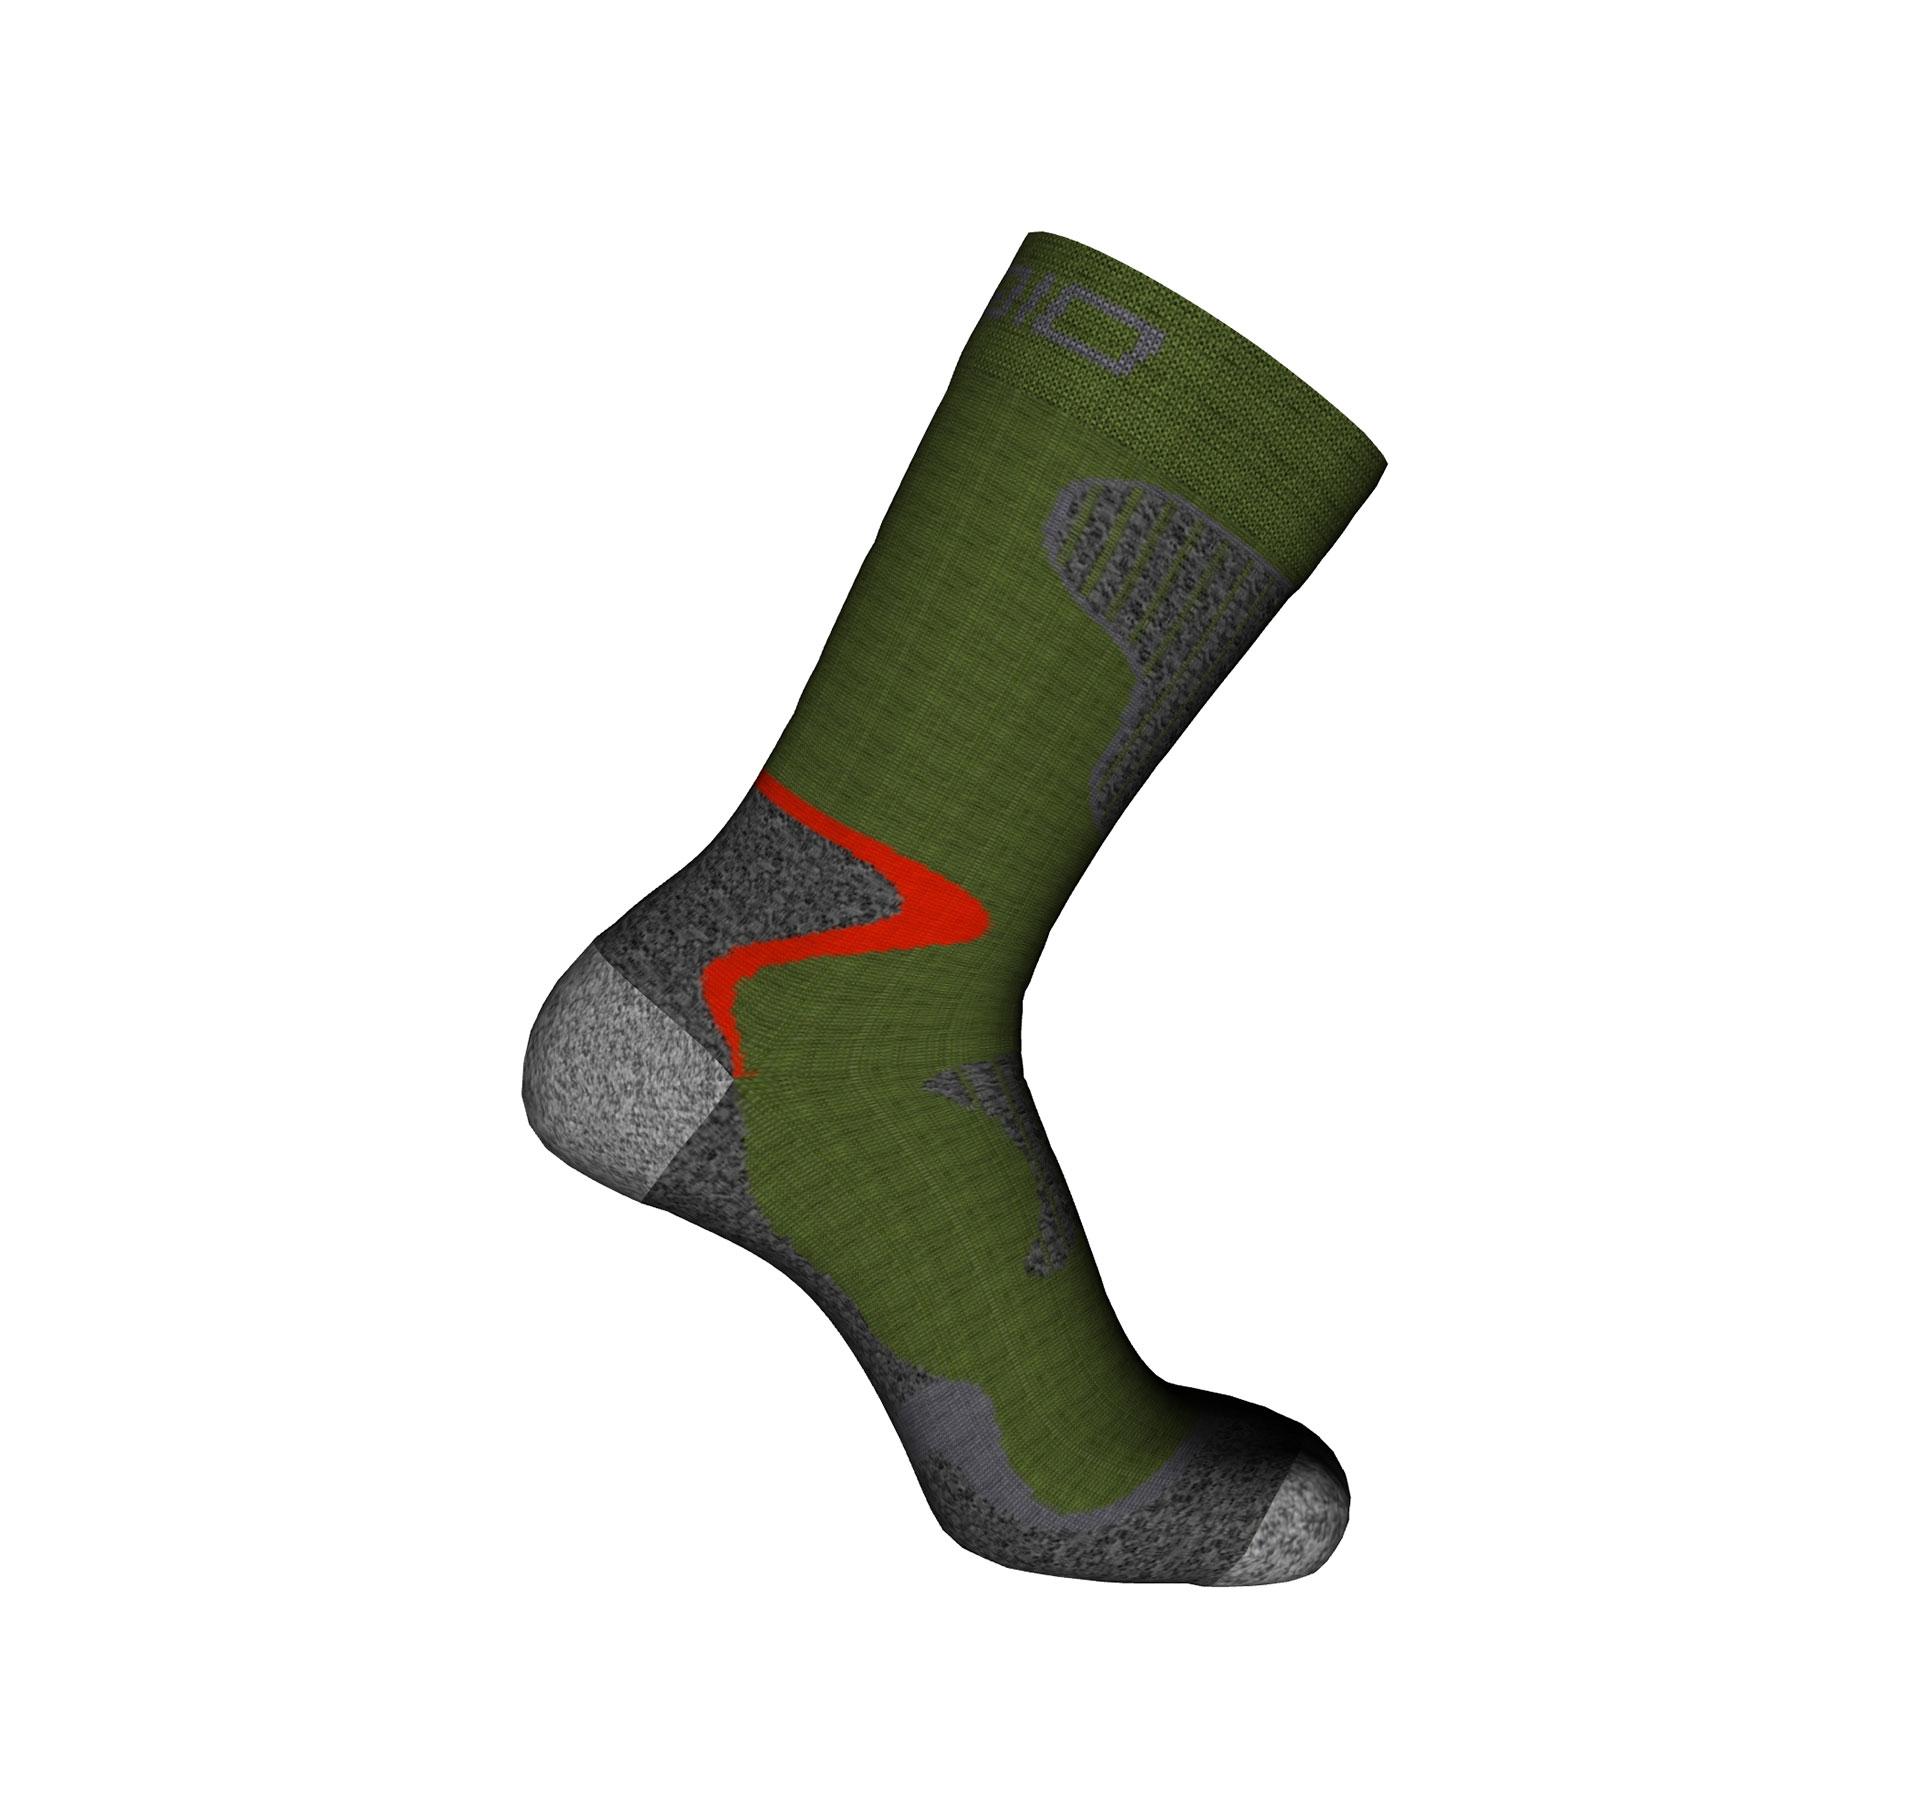 Hunting and fishing socks